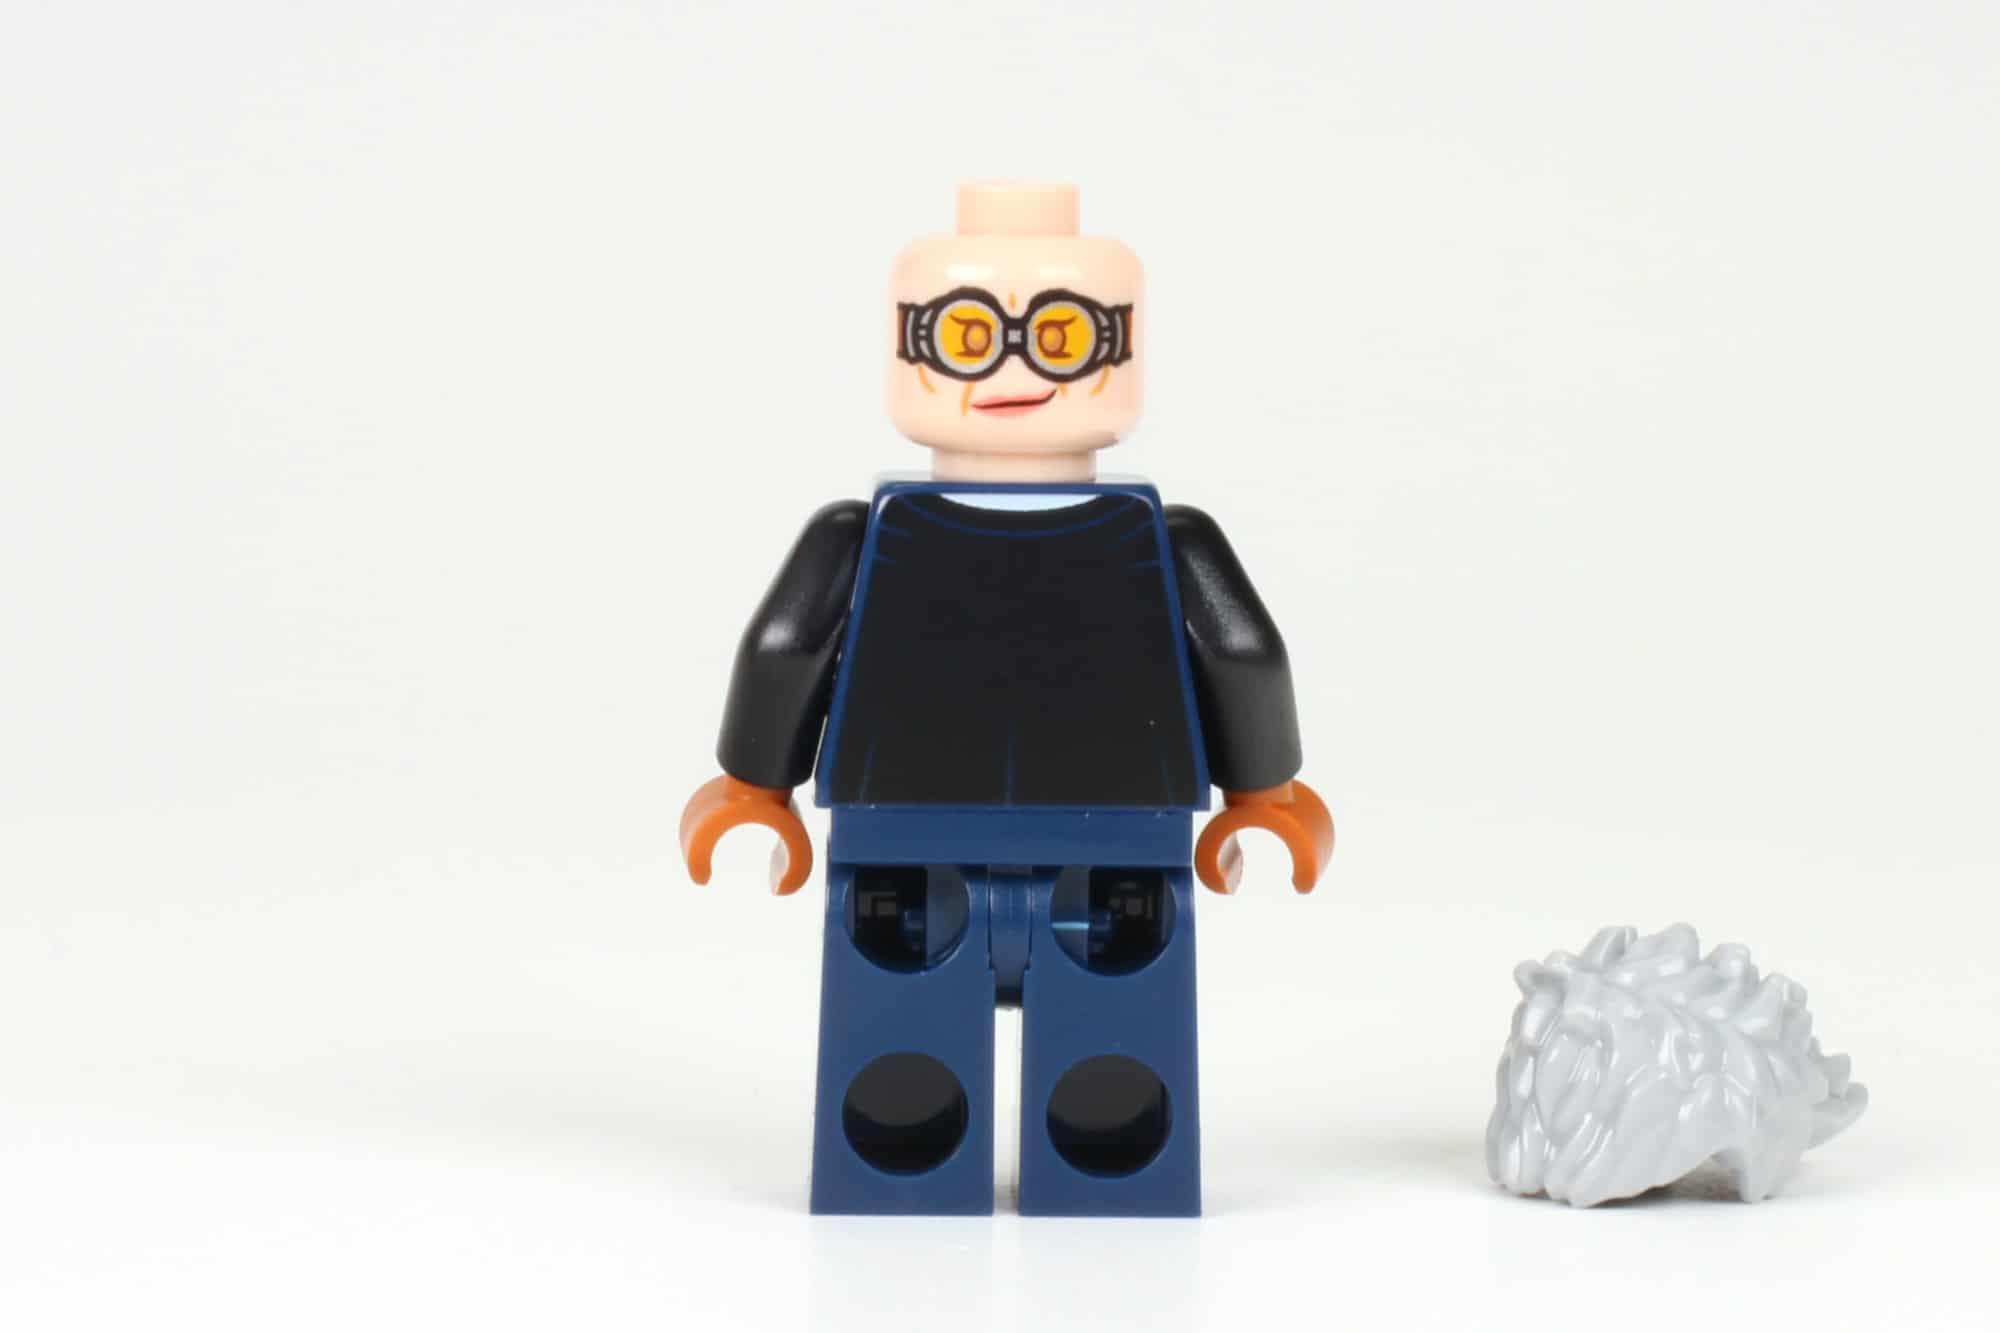 LEGO Harry Potter 76395 Hogwarts Erste Flugstunde Minifiguren 3 3